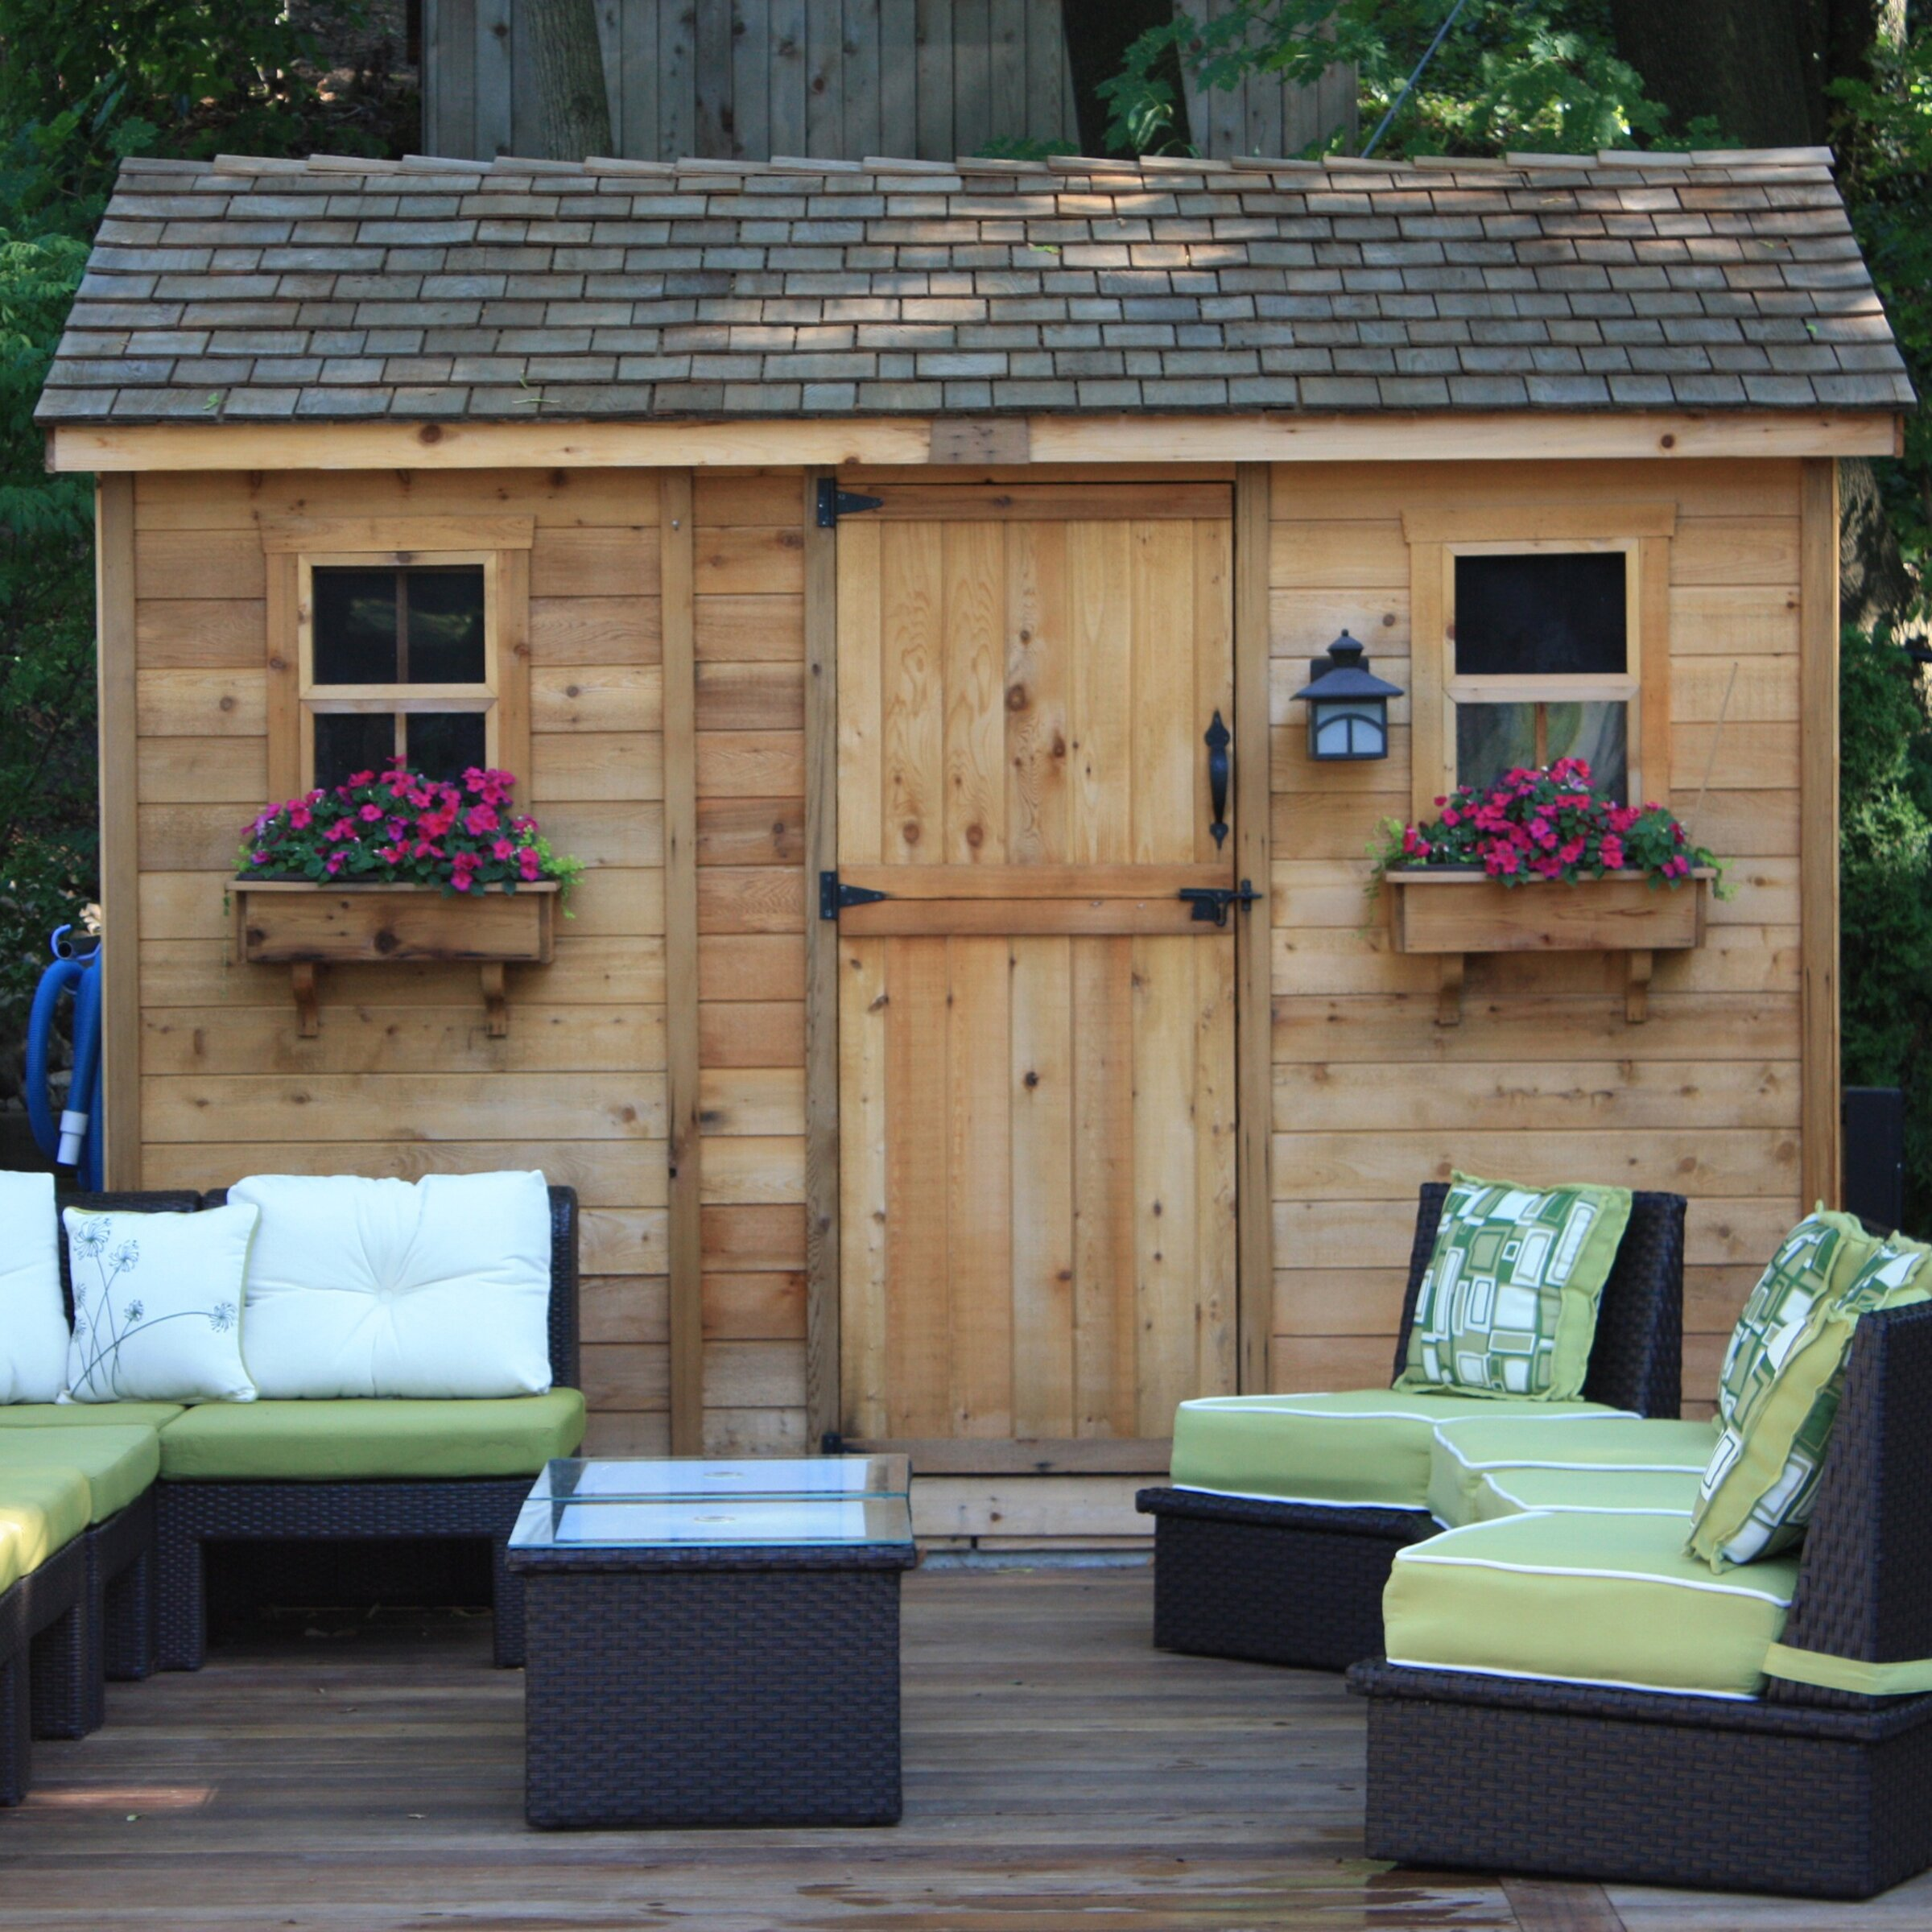 Cabana 12 Ft. W x 8 Ft. D Wood Garden Shed   Wayfair on Outdoor Living Today Cabana id=35824